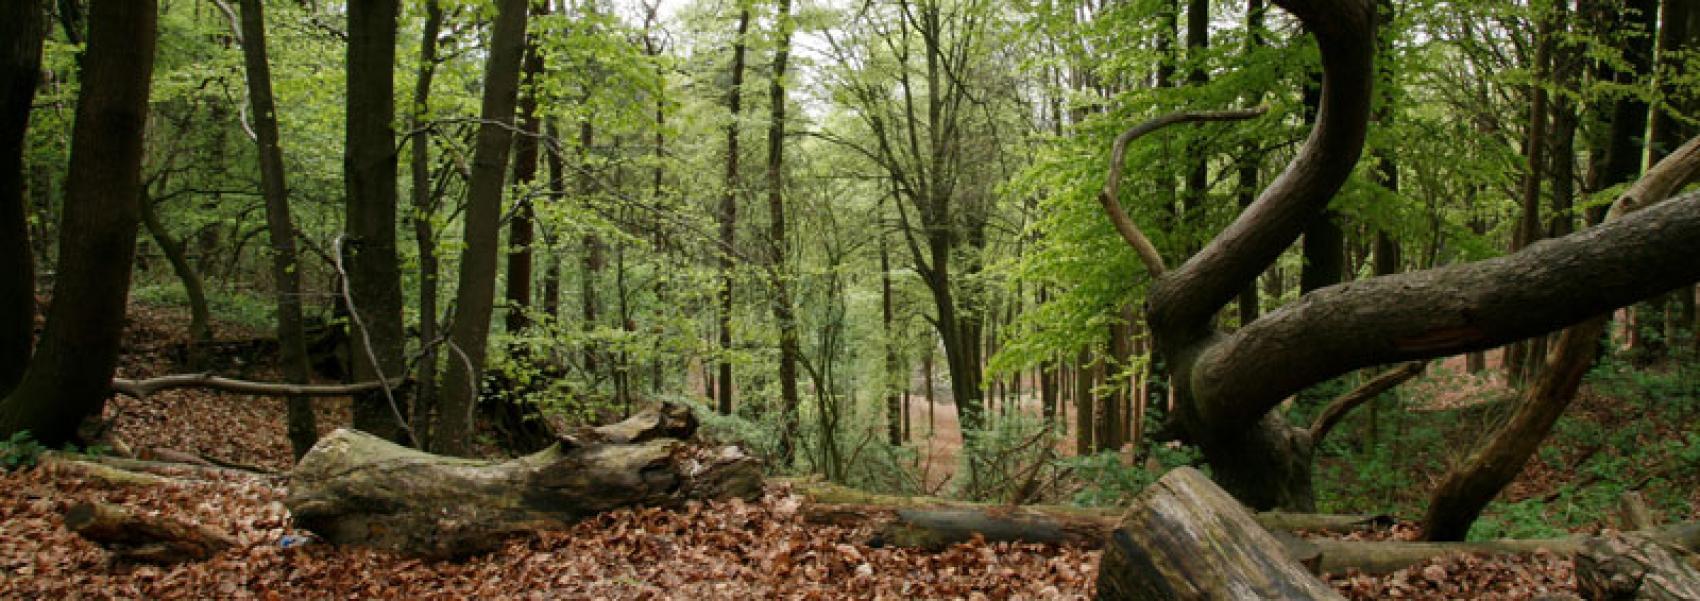 Kluisbos dood hout